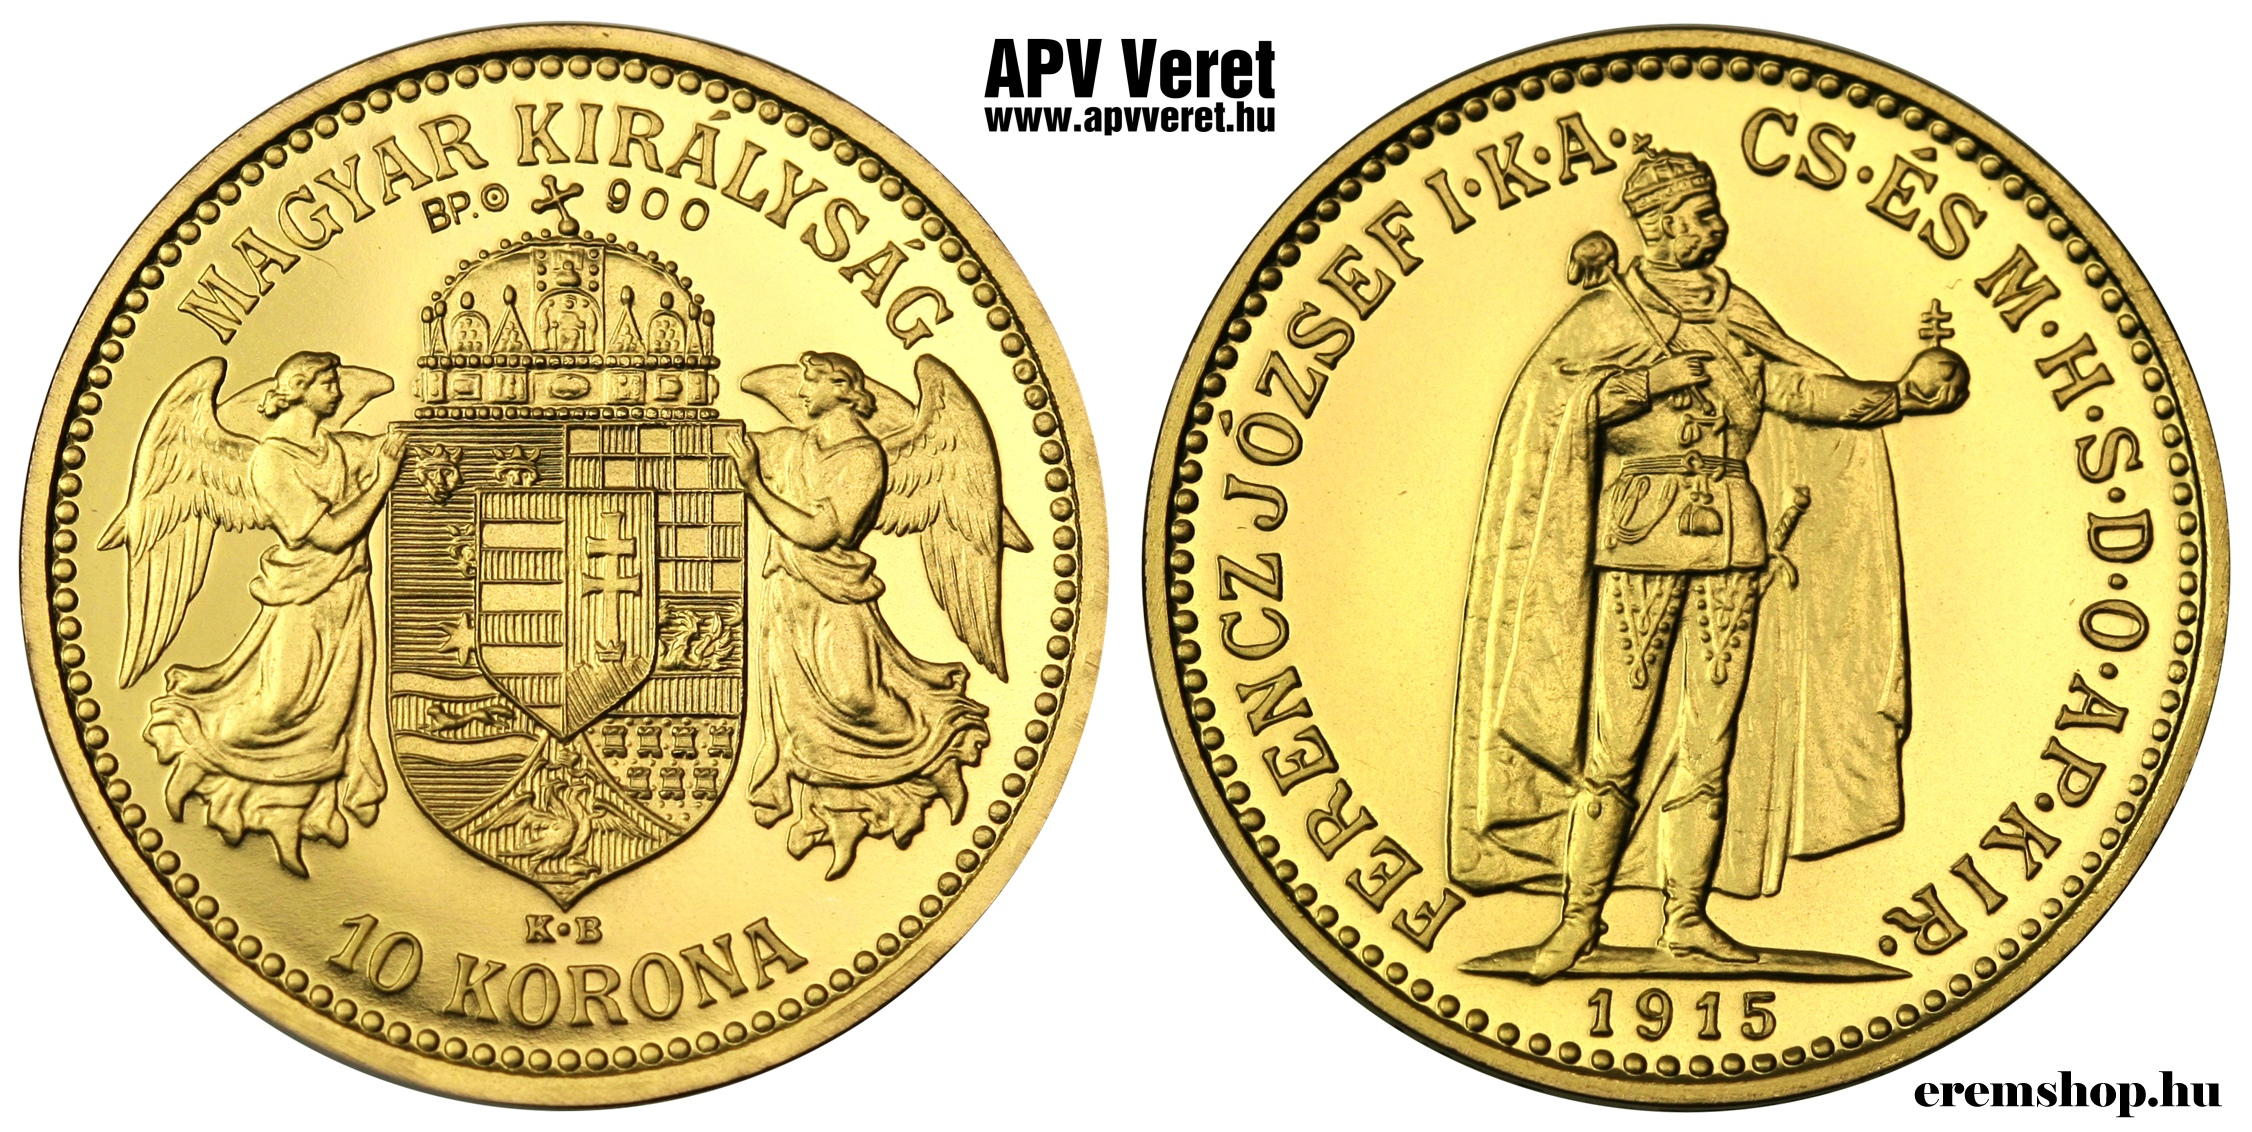 http://www.apvveret.hu/korona-penzvero-utanveret/www_apvveret_hu_arany_jelolt_1915_10_korona_penzvero-utanveret.jpg